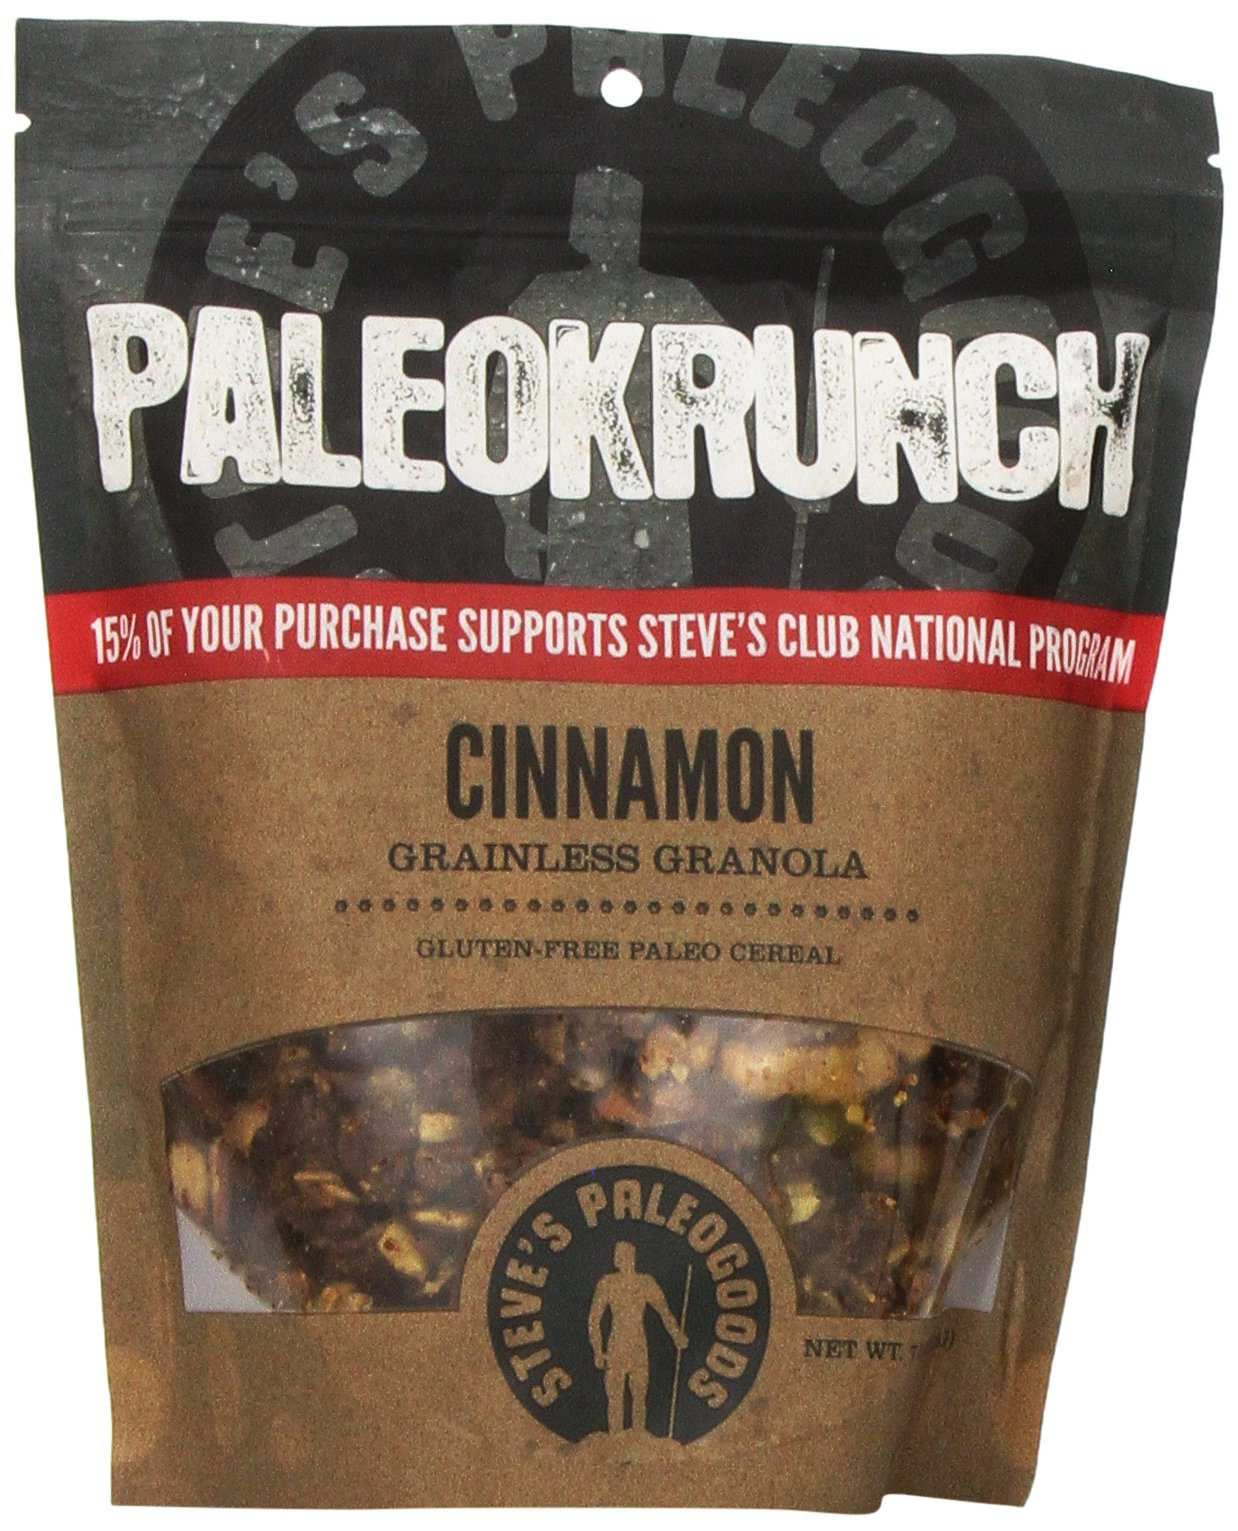 Paleokrunch Paleo Cereal Grainless Granola, Cinnamon, 7.5 oz